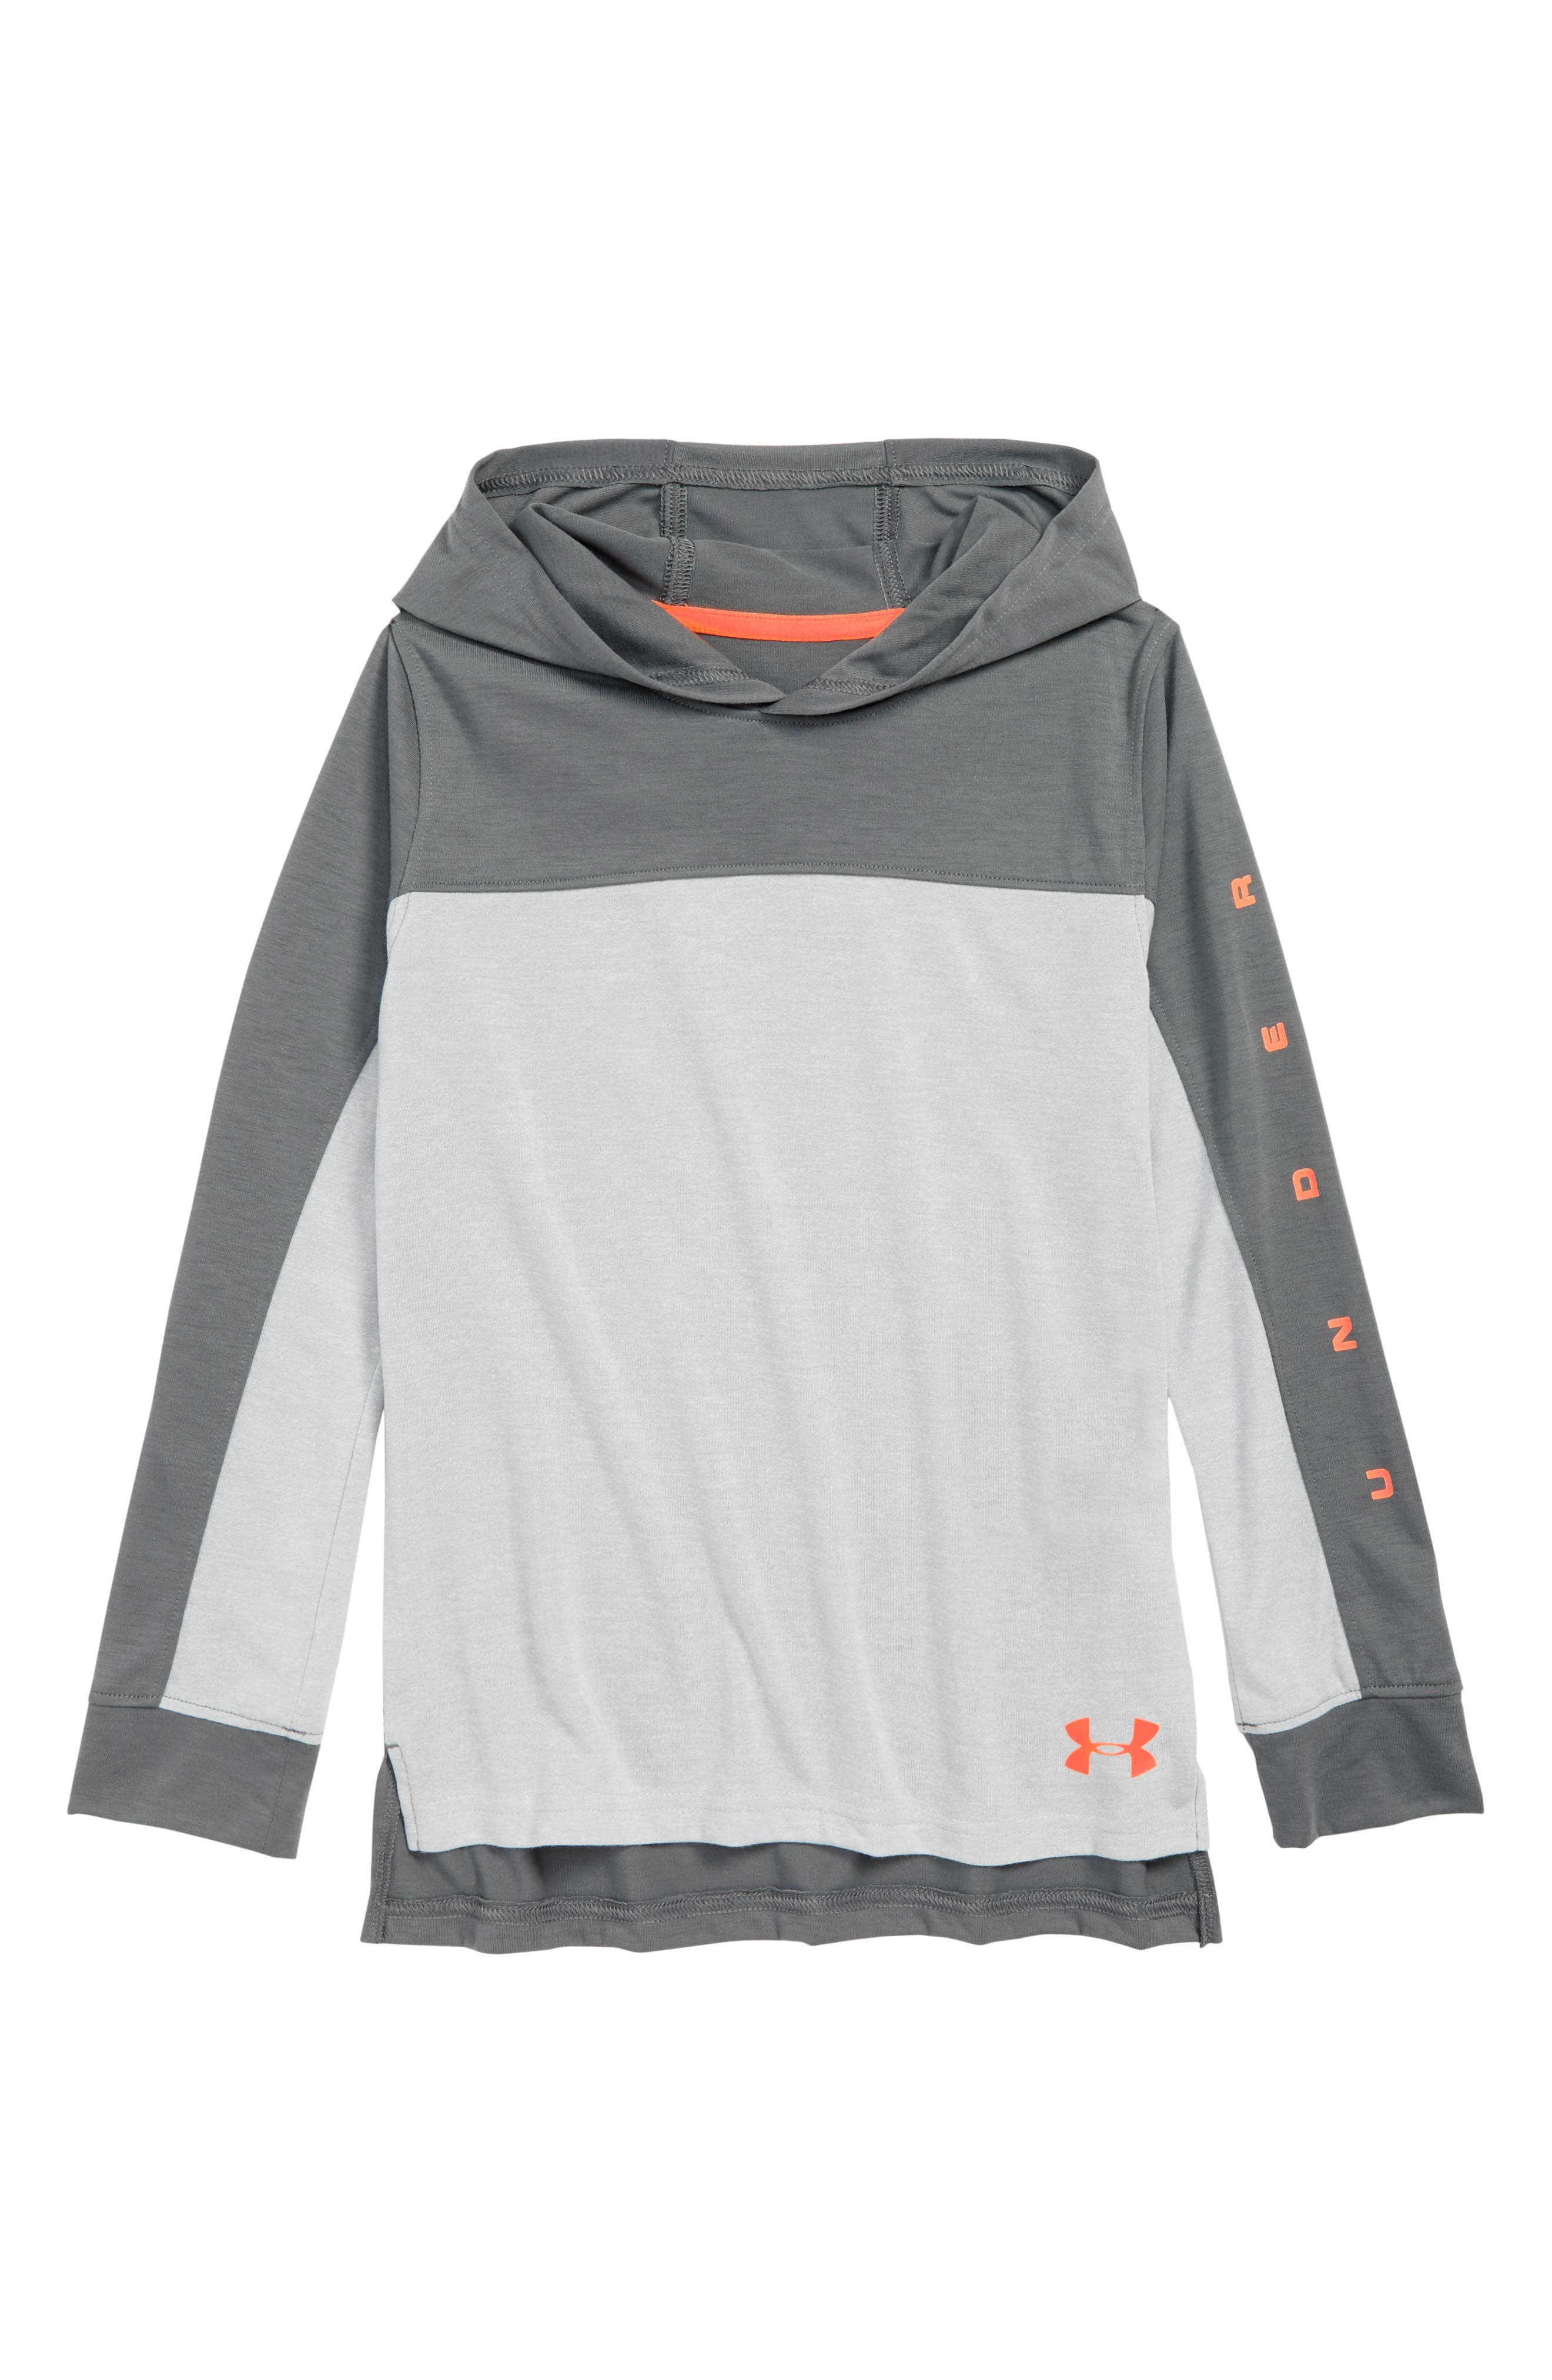 Boys Under Armour Relay Hoodie Size XL (16)  Grey